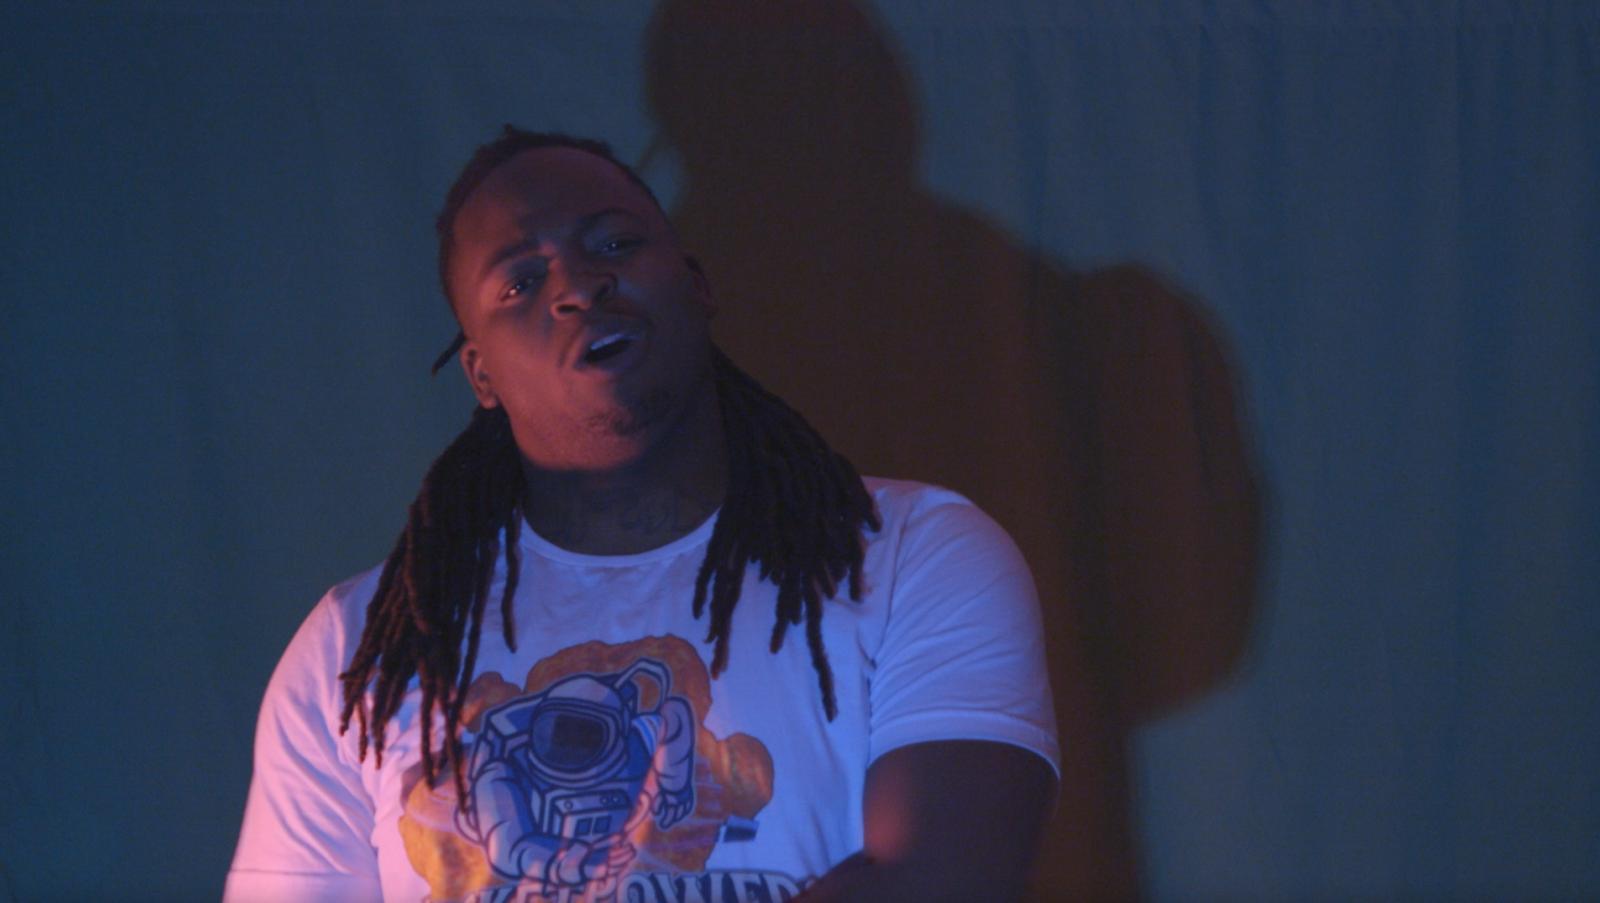 James Samuels aka DreadRock Rising Rapper from Chicago